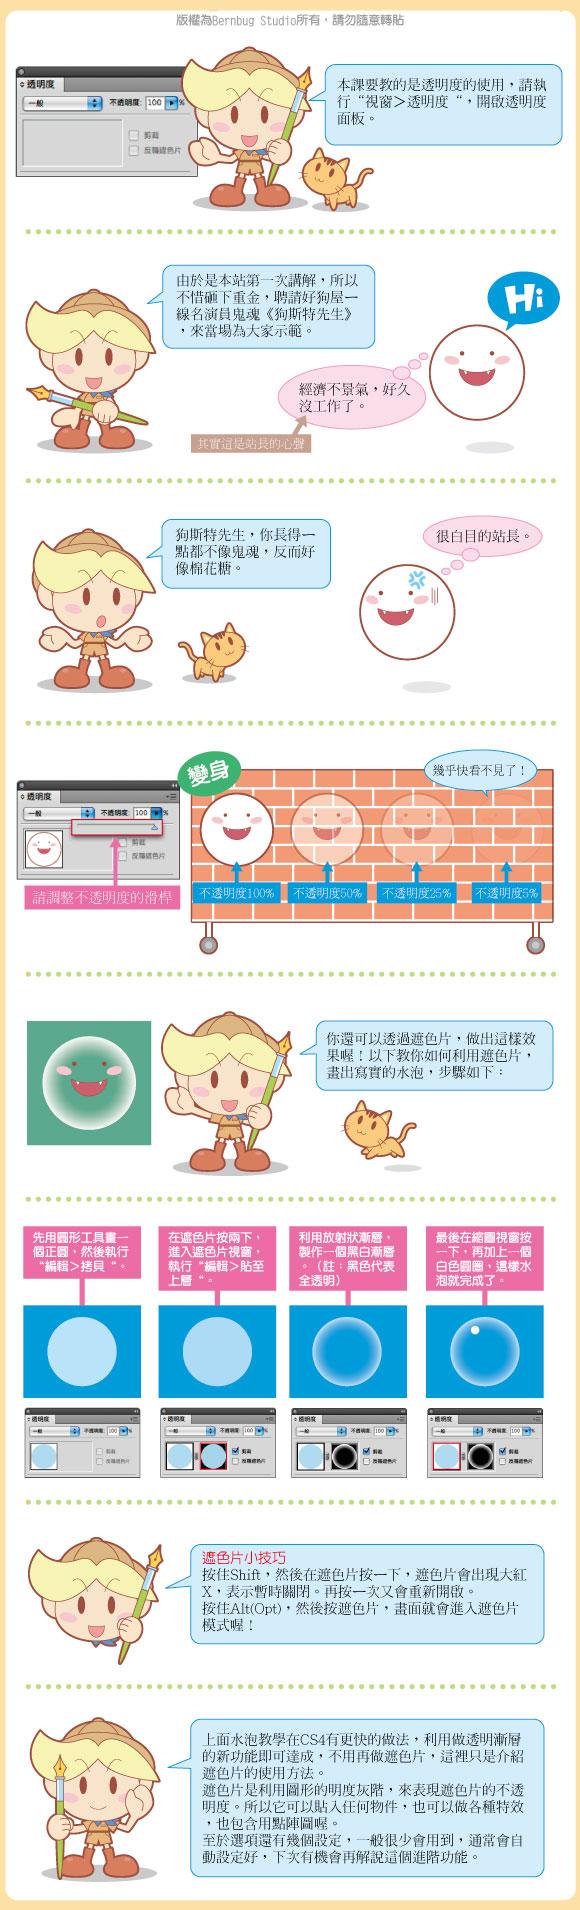 lesson1.jpg